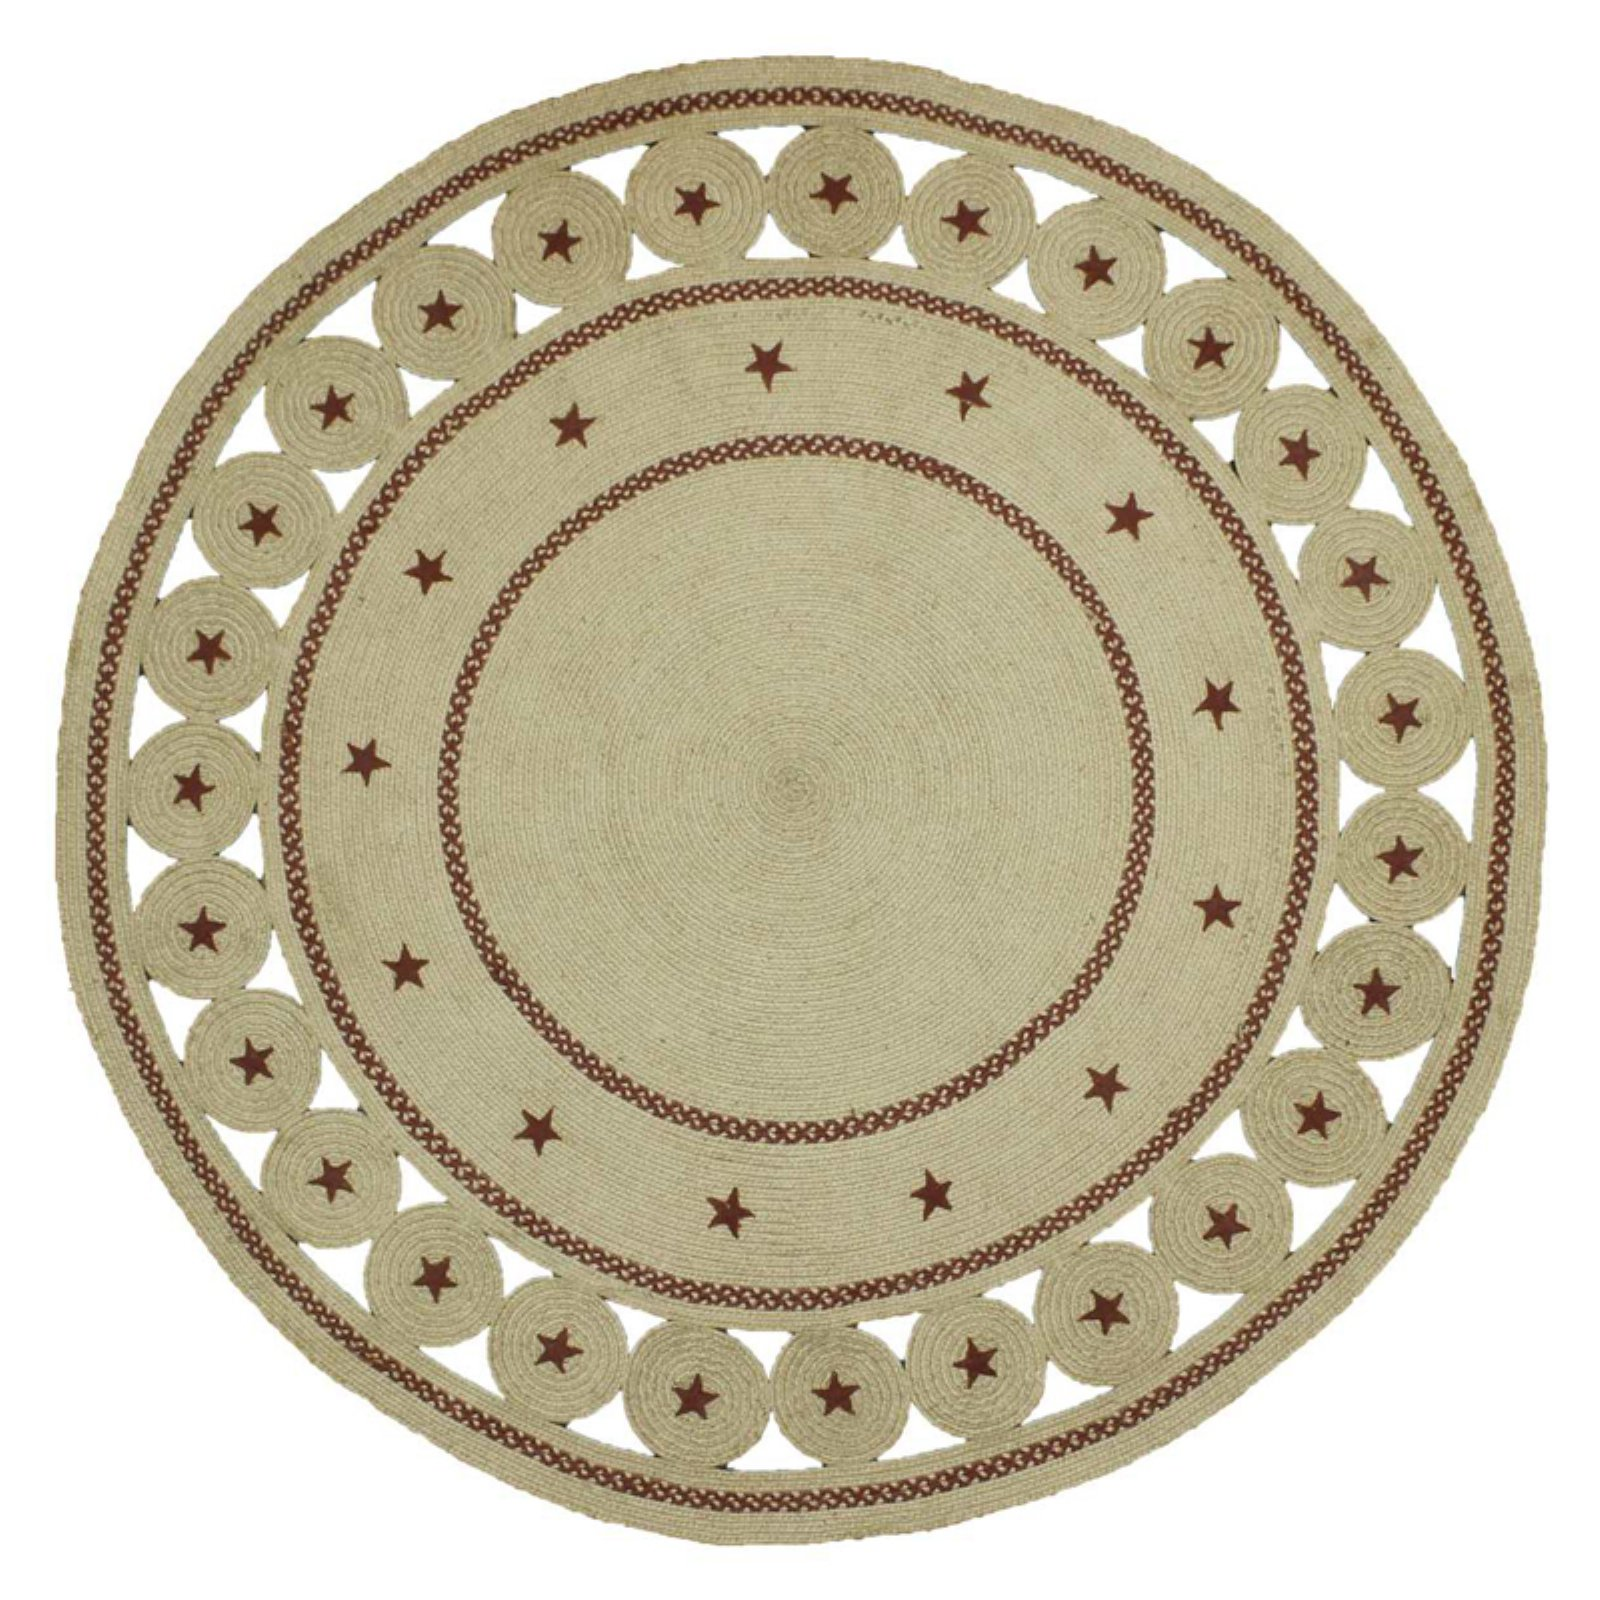 Homespice Decor Texas Star Round Braided Rug